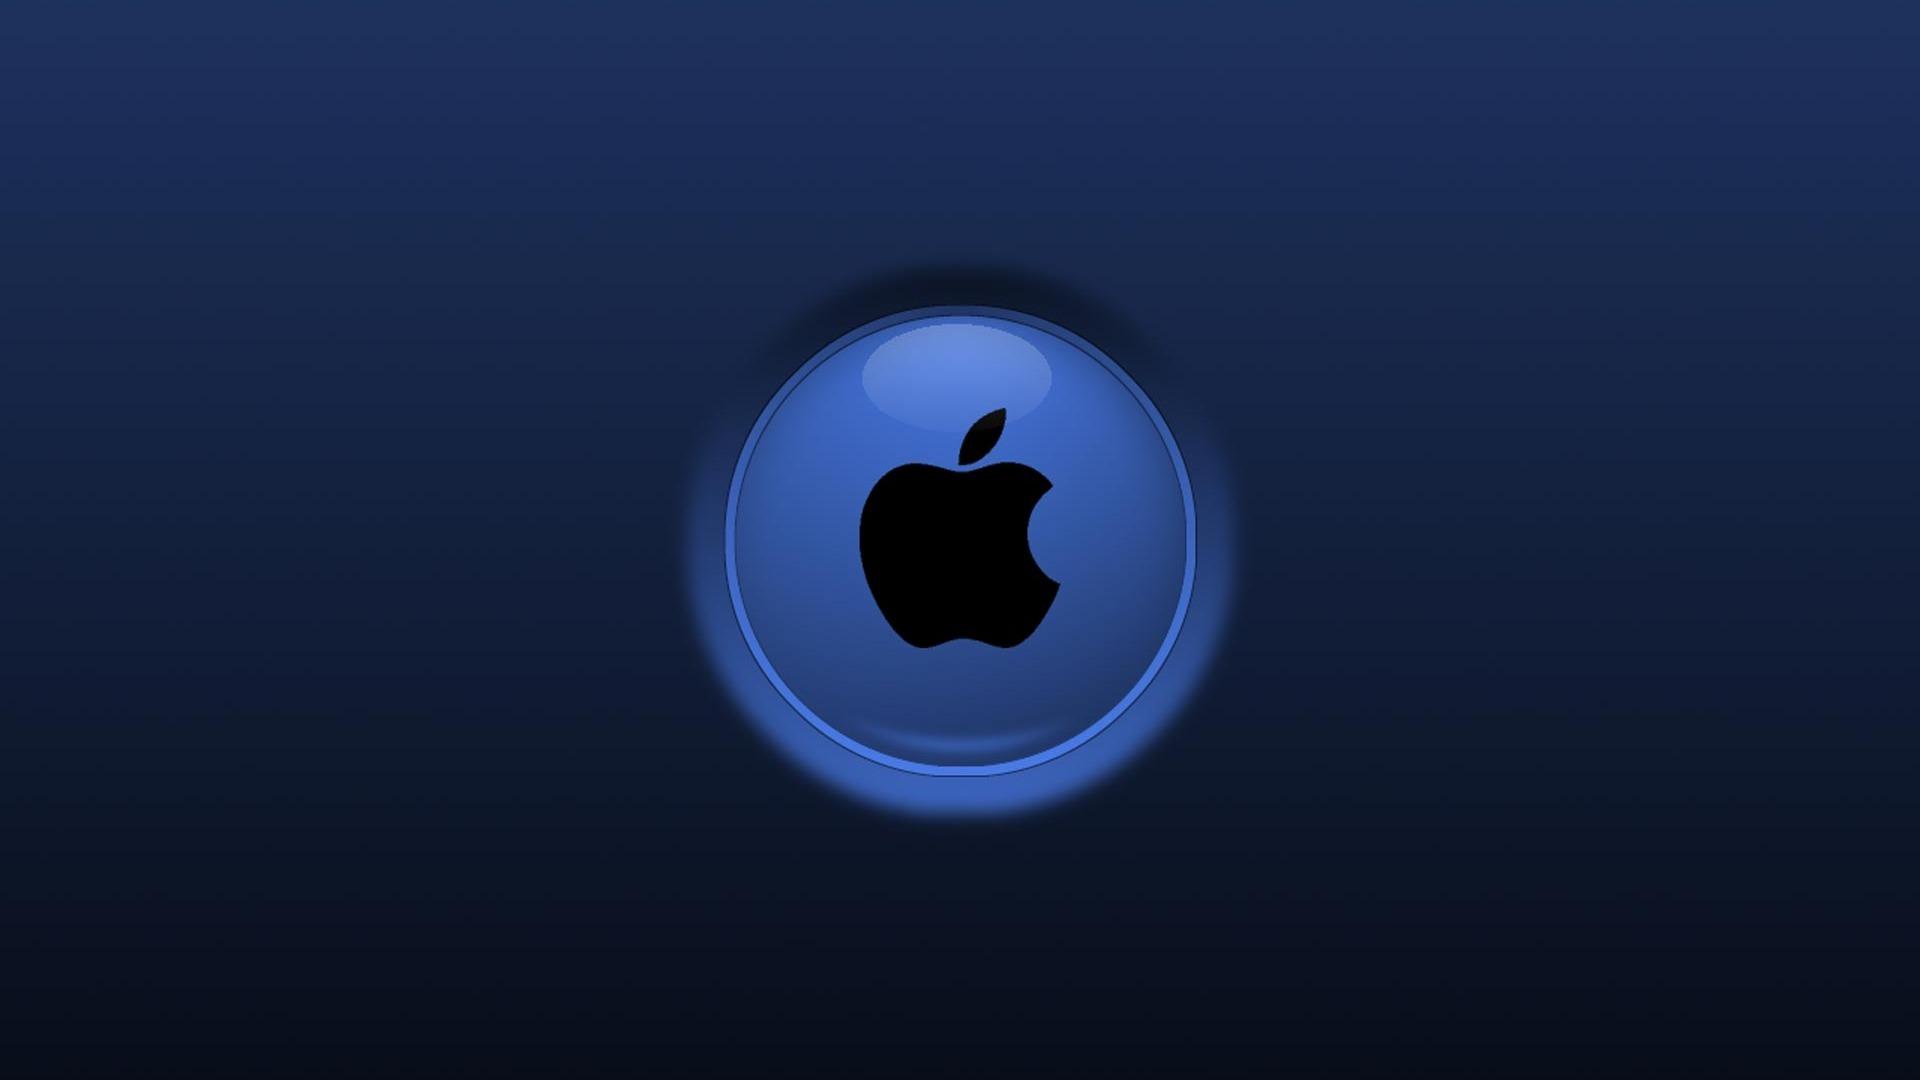 Apple logo wallpaper 605 1920x1080